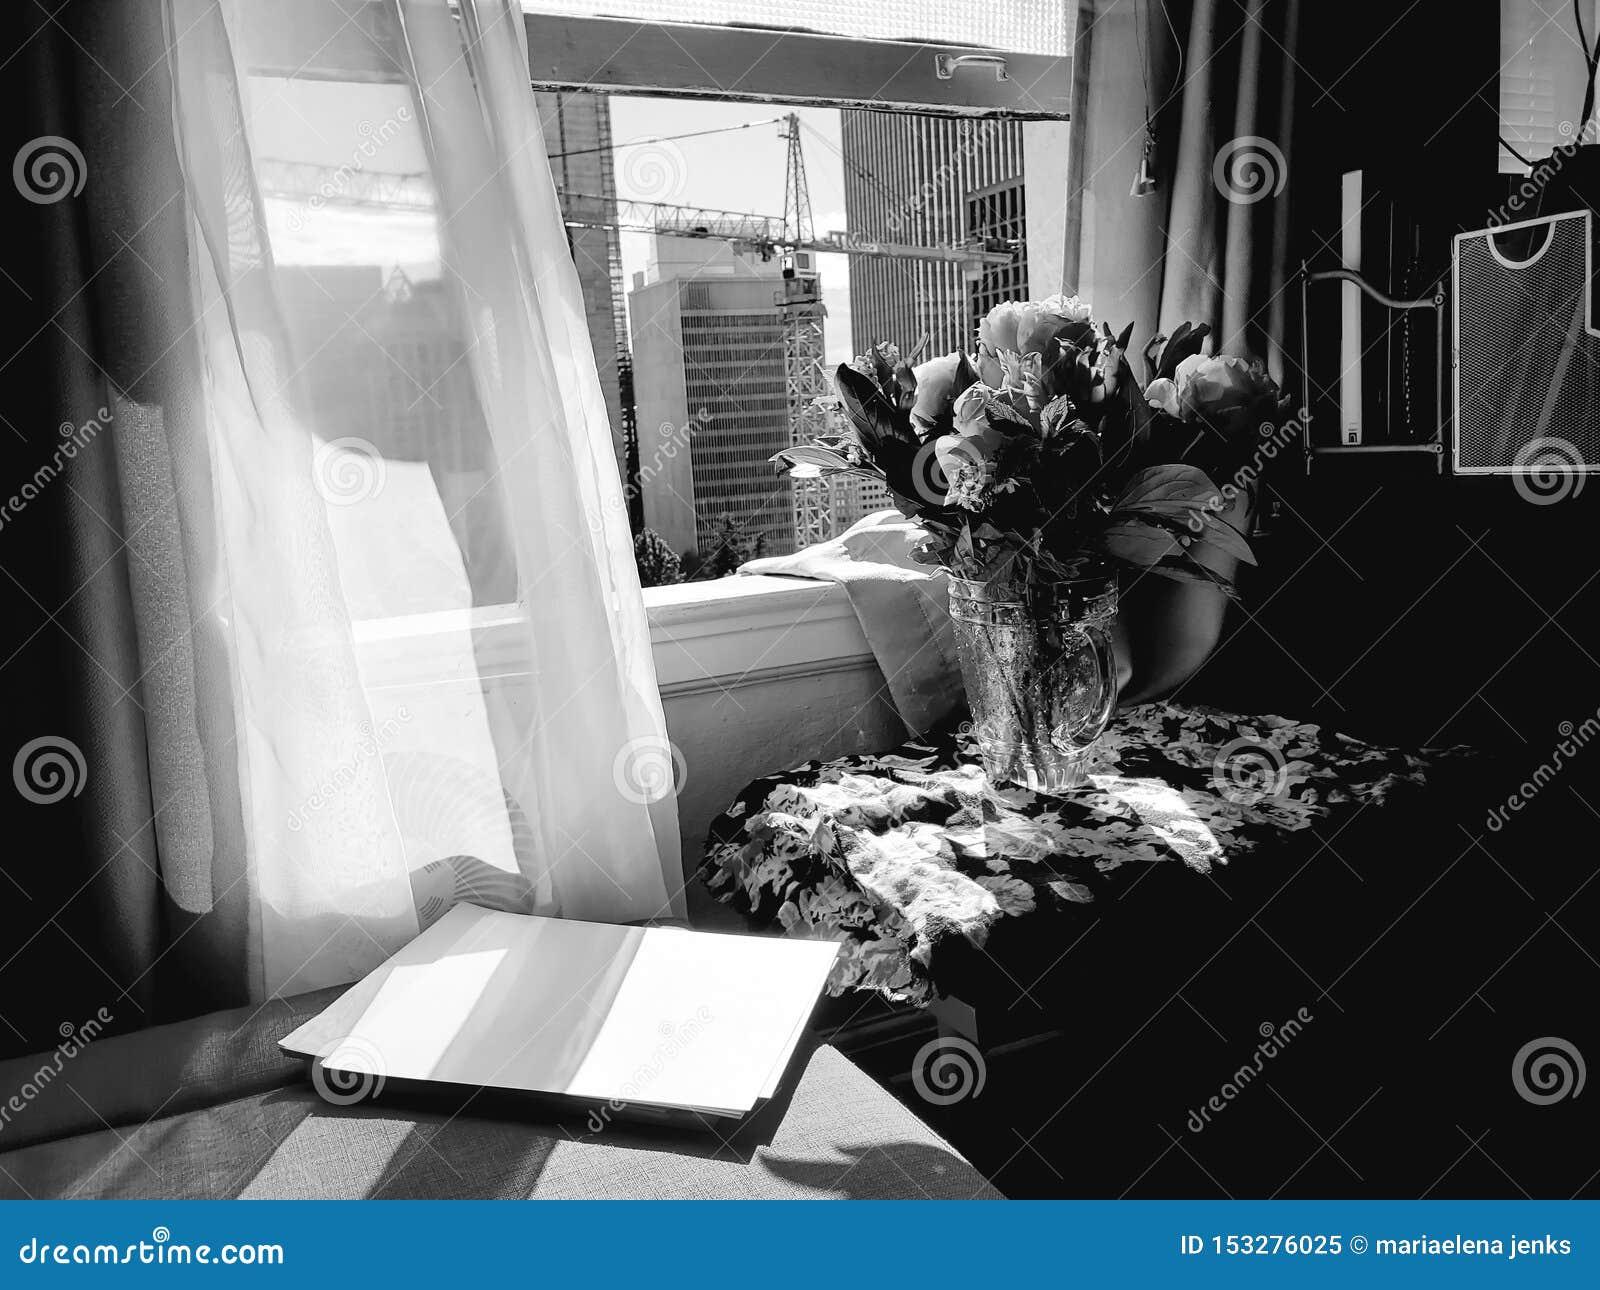 Fiori in una finestra